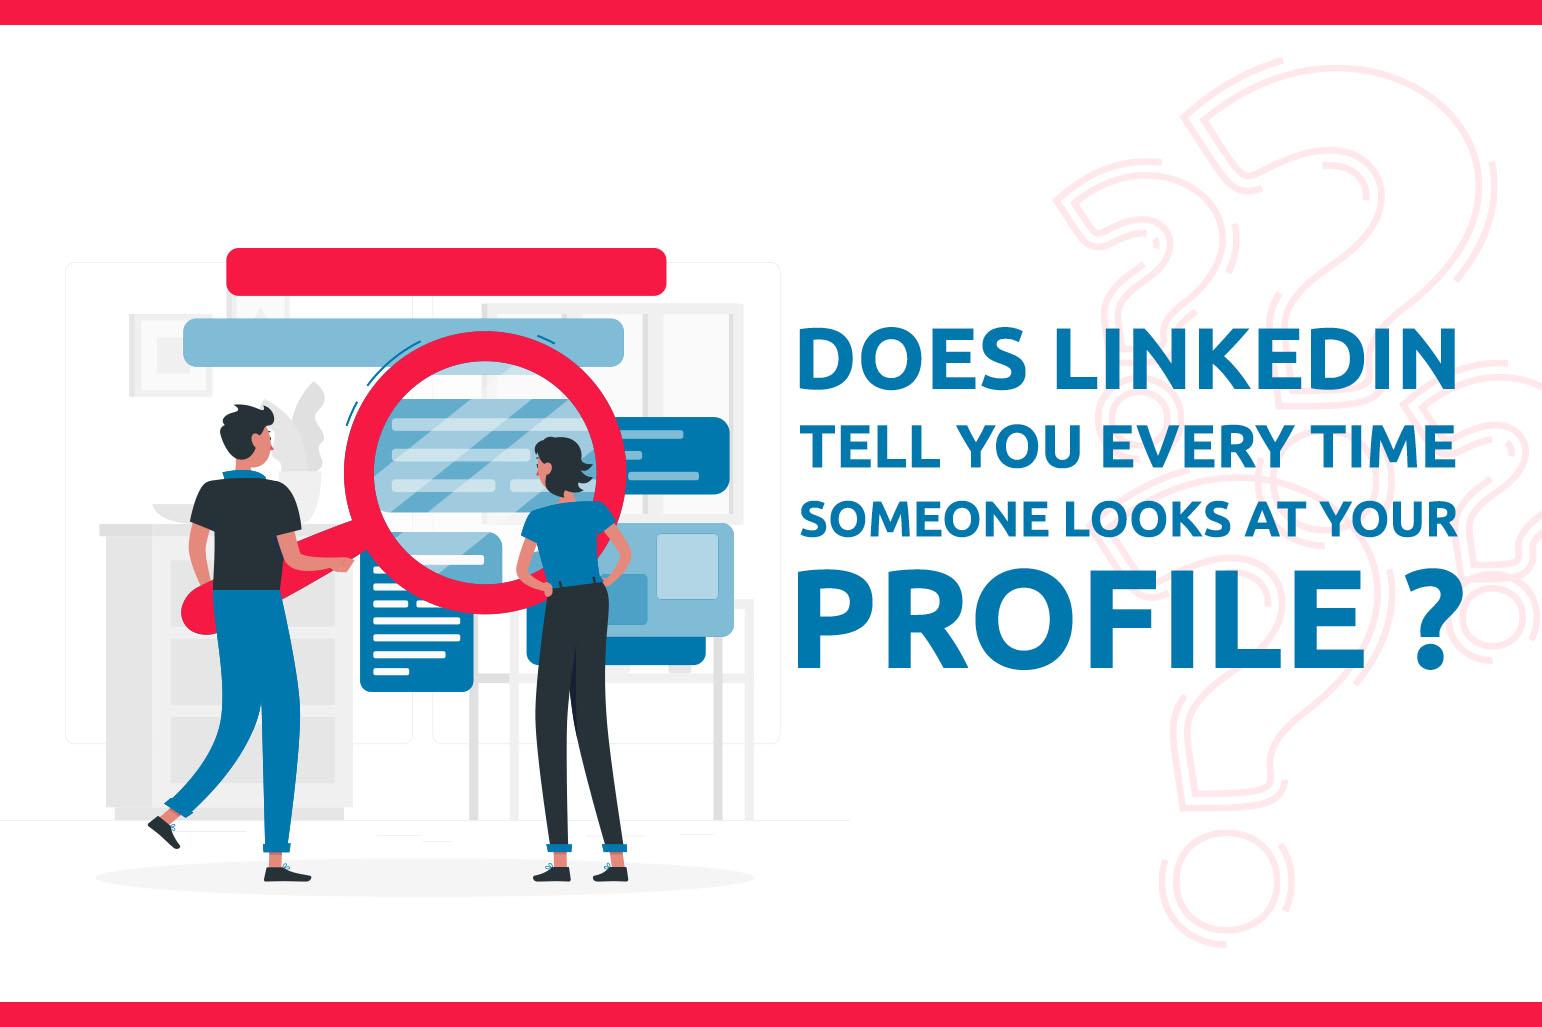 LinkedIn是否会在每次有人看你的资料时告诉你?